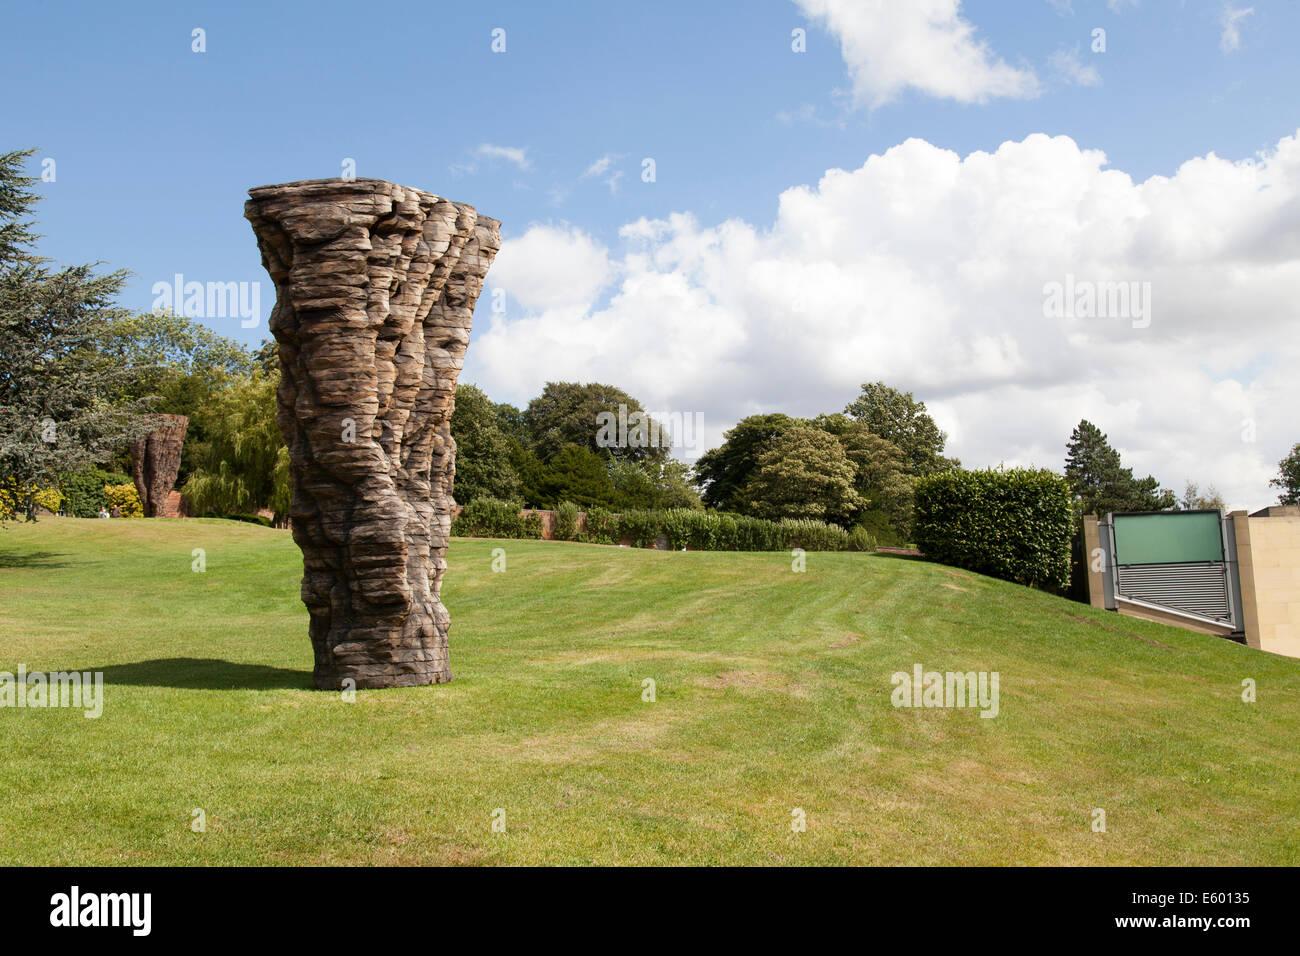 Sculpture titled  for Martin F. by Ursula von Rydingsvard  at Yorkshire Sculpture Park - Stock Image